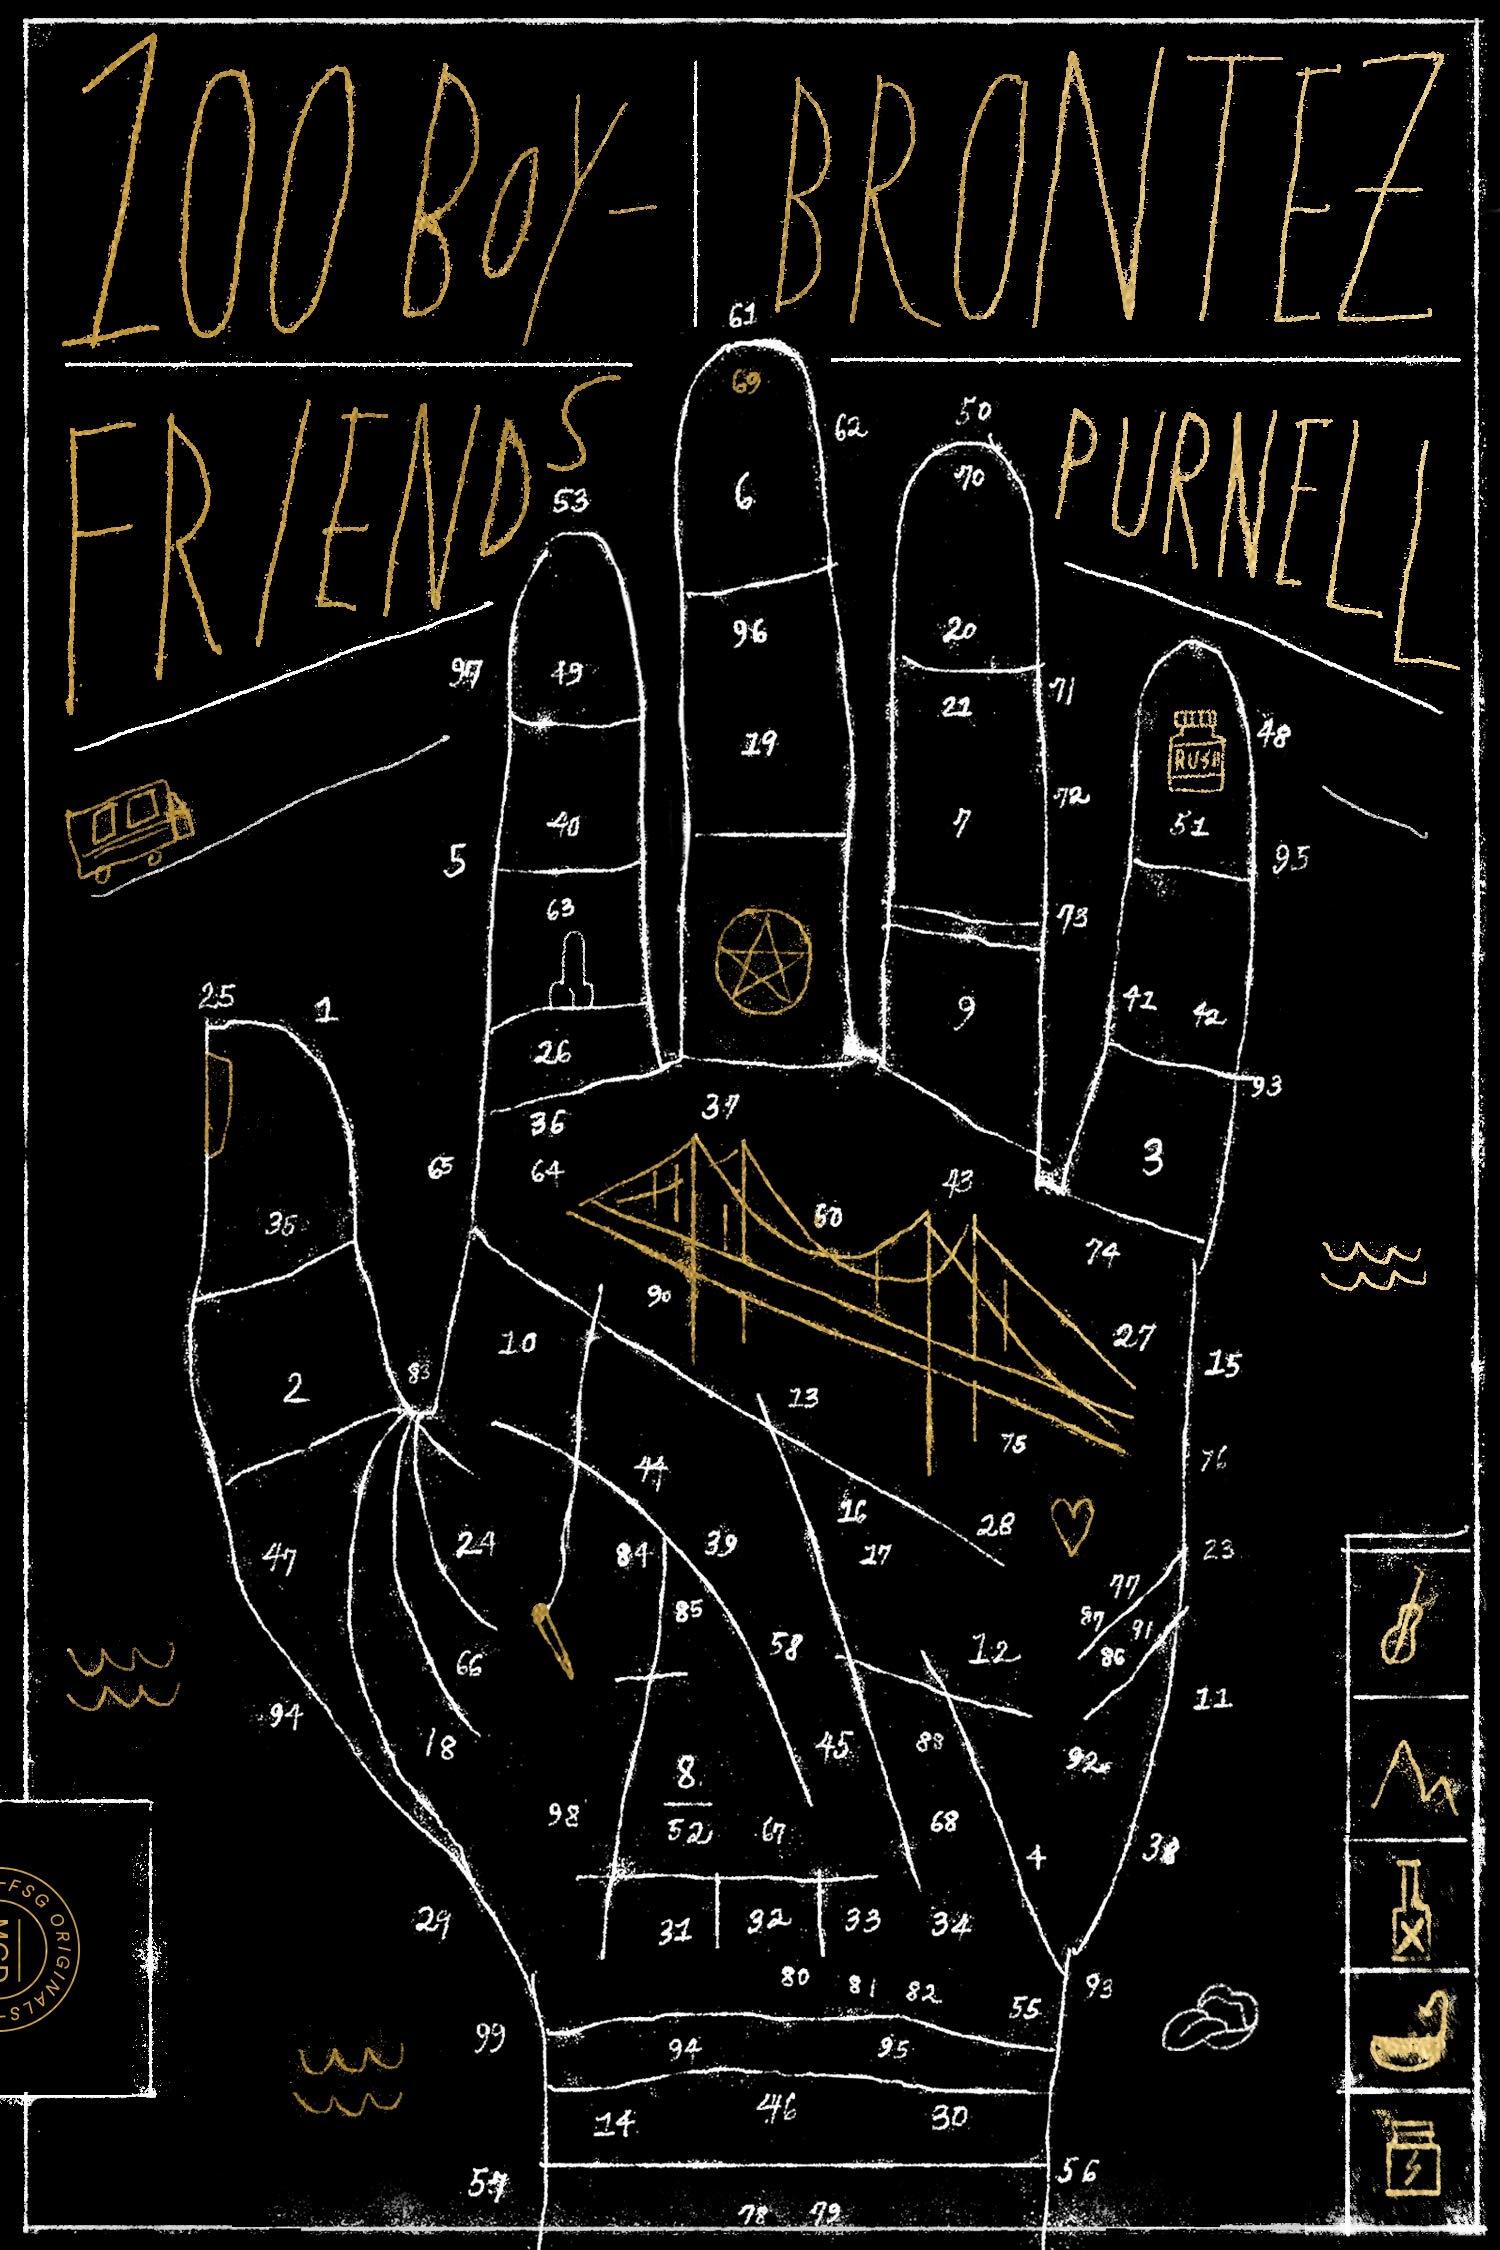 100 Boyfriends: Purnell, Brontez: 9780374538989: Books - Amazon.ca